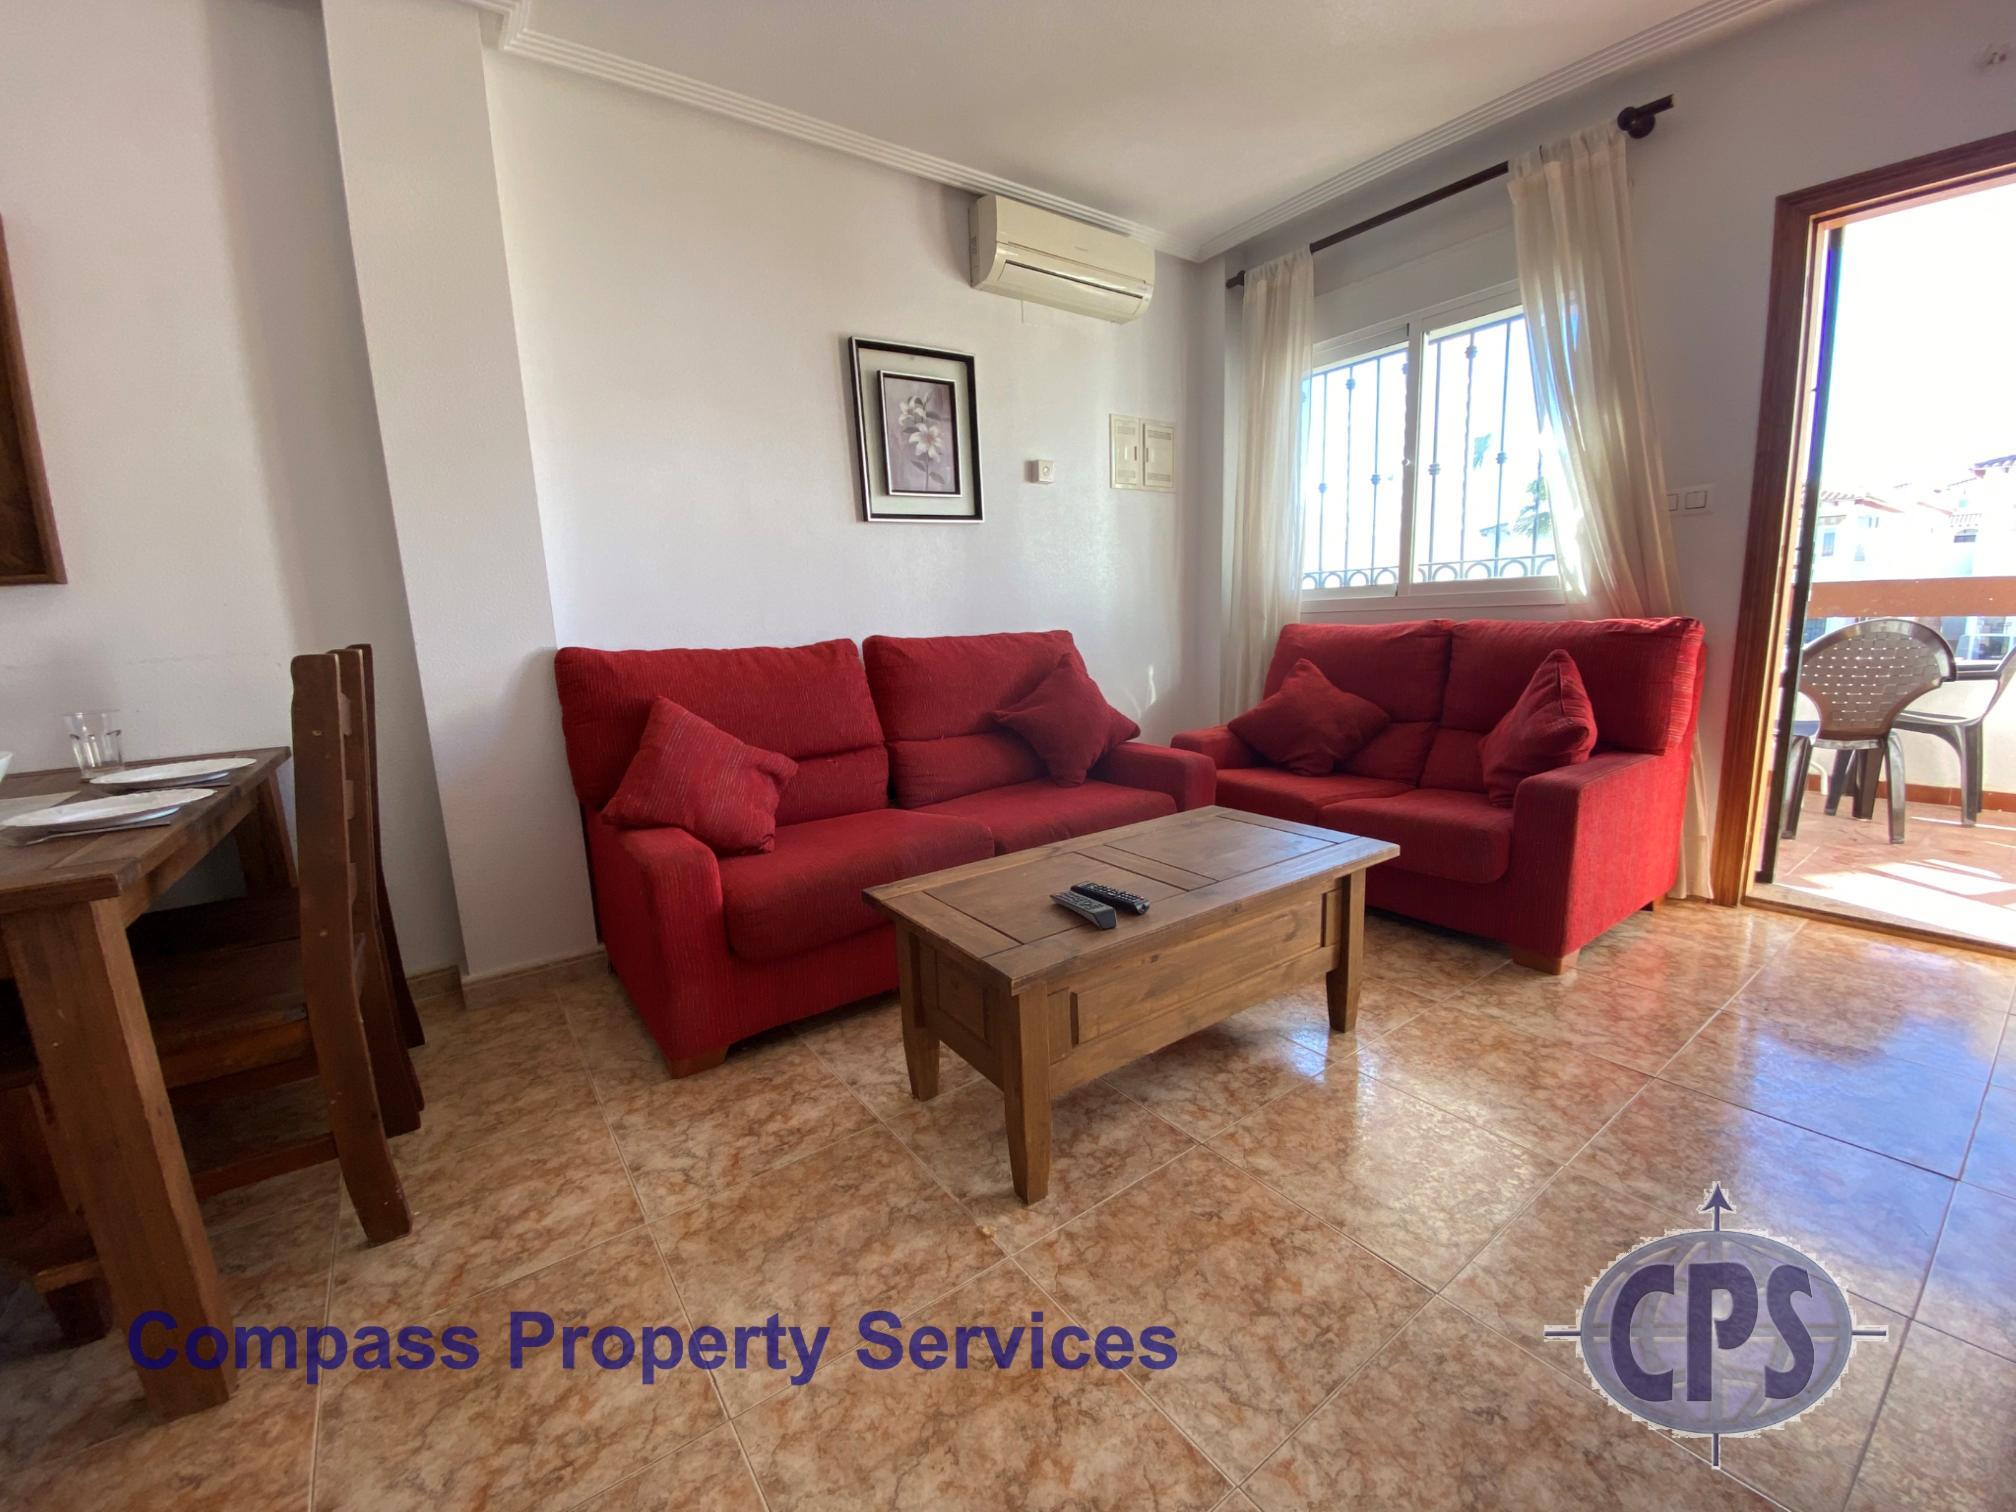 Apartment La Cinuelica R3 1st flr apt overlooking pool l149 photo 28556776